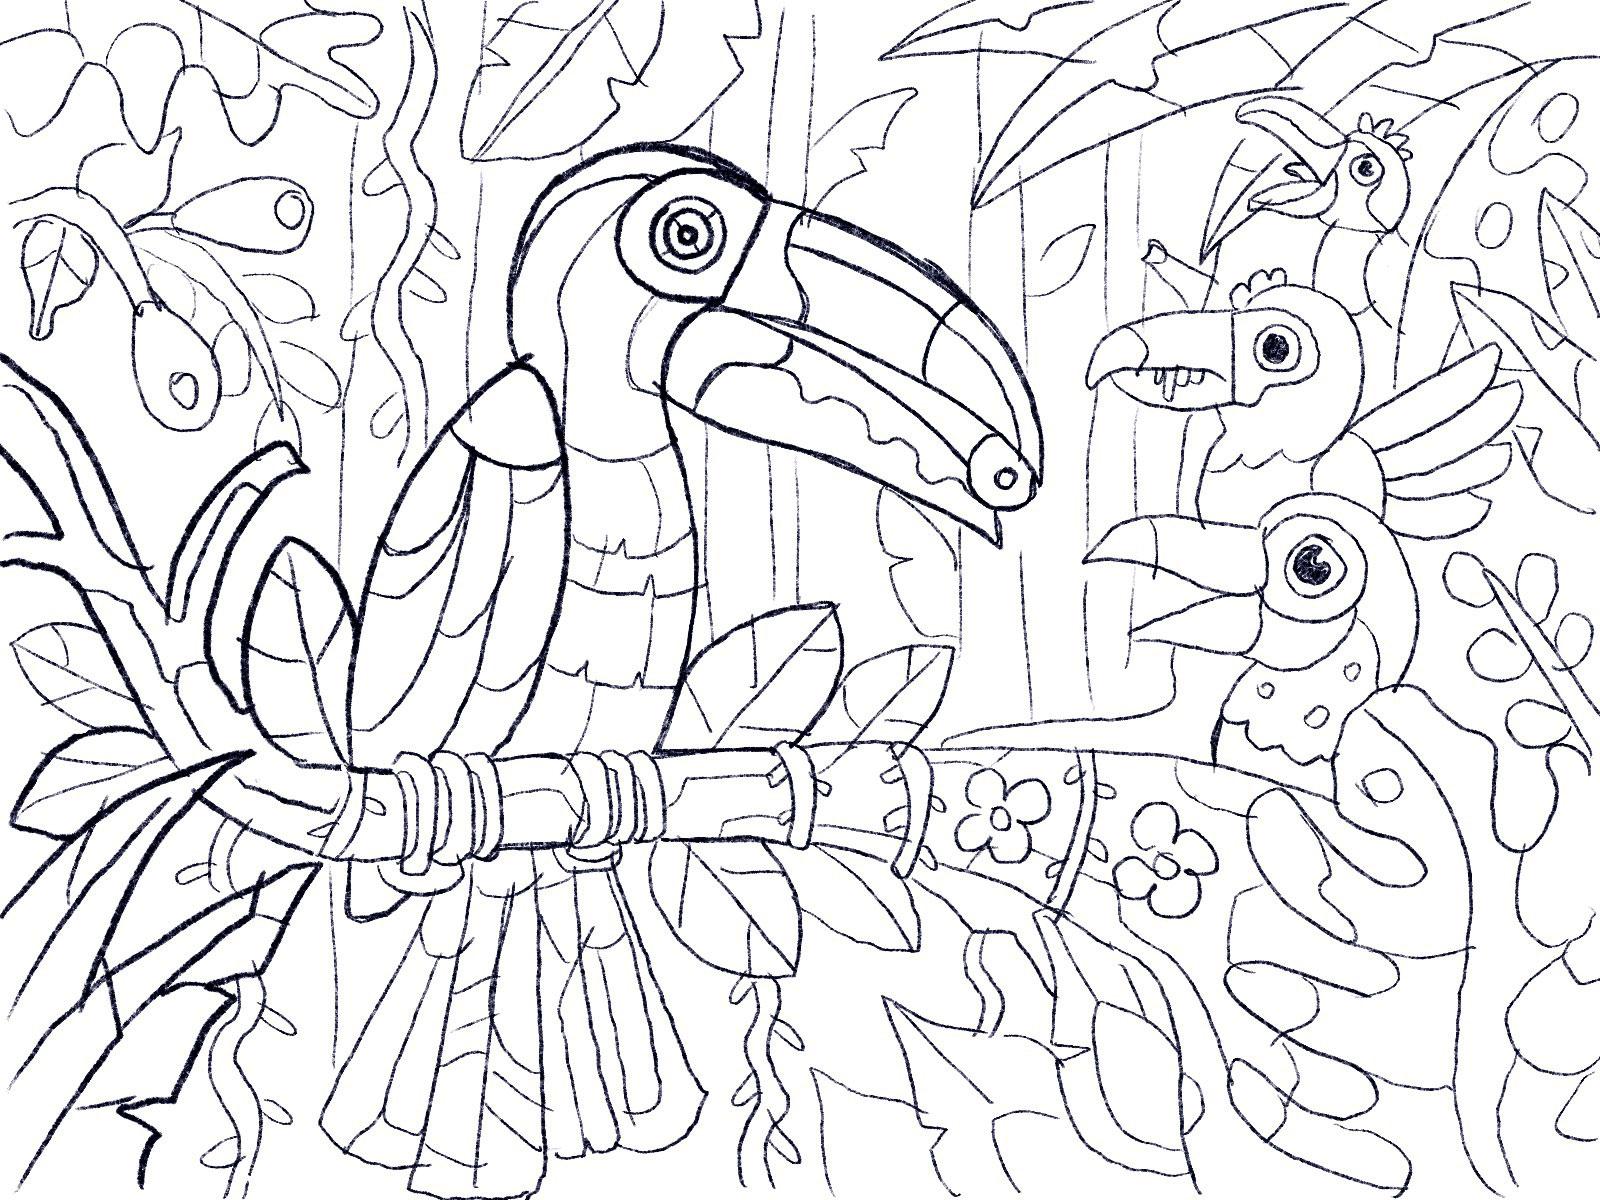 Alex Krugli Projects Gallery Coloring Book Decor Dribbble